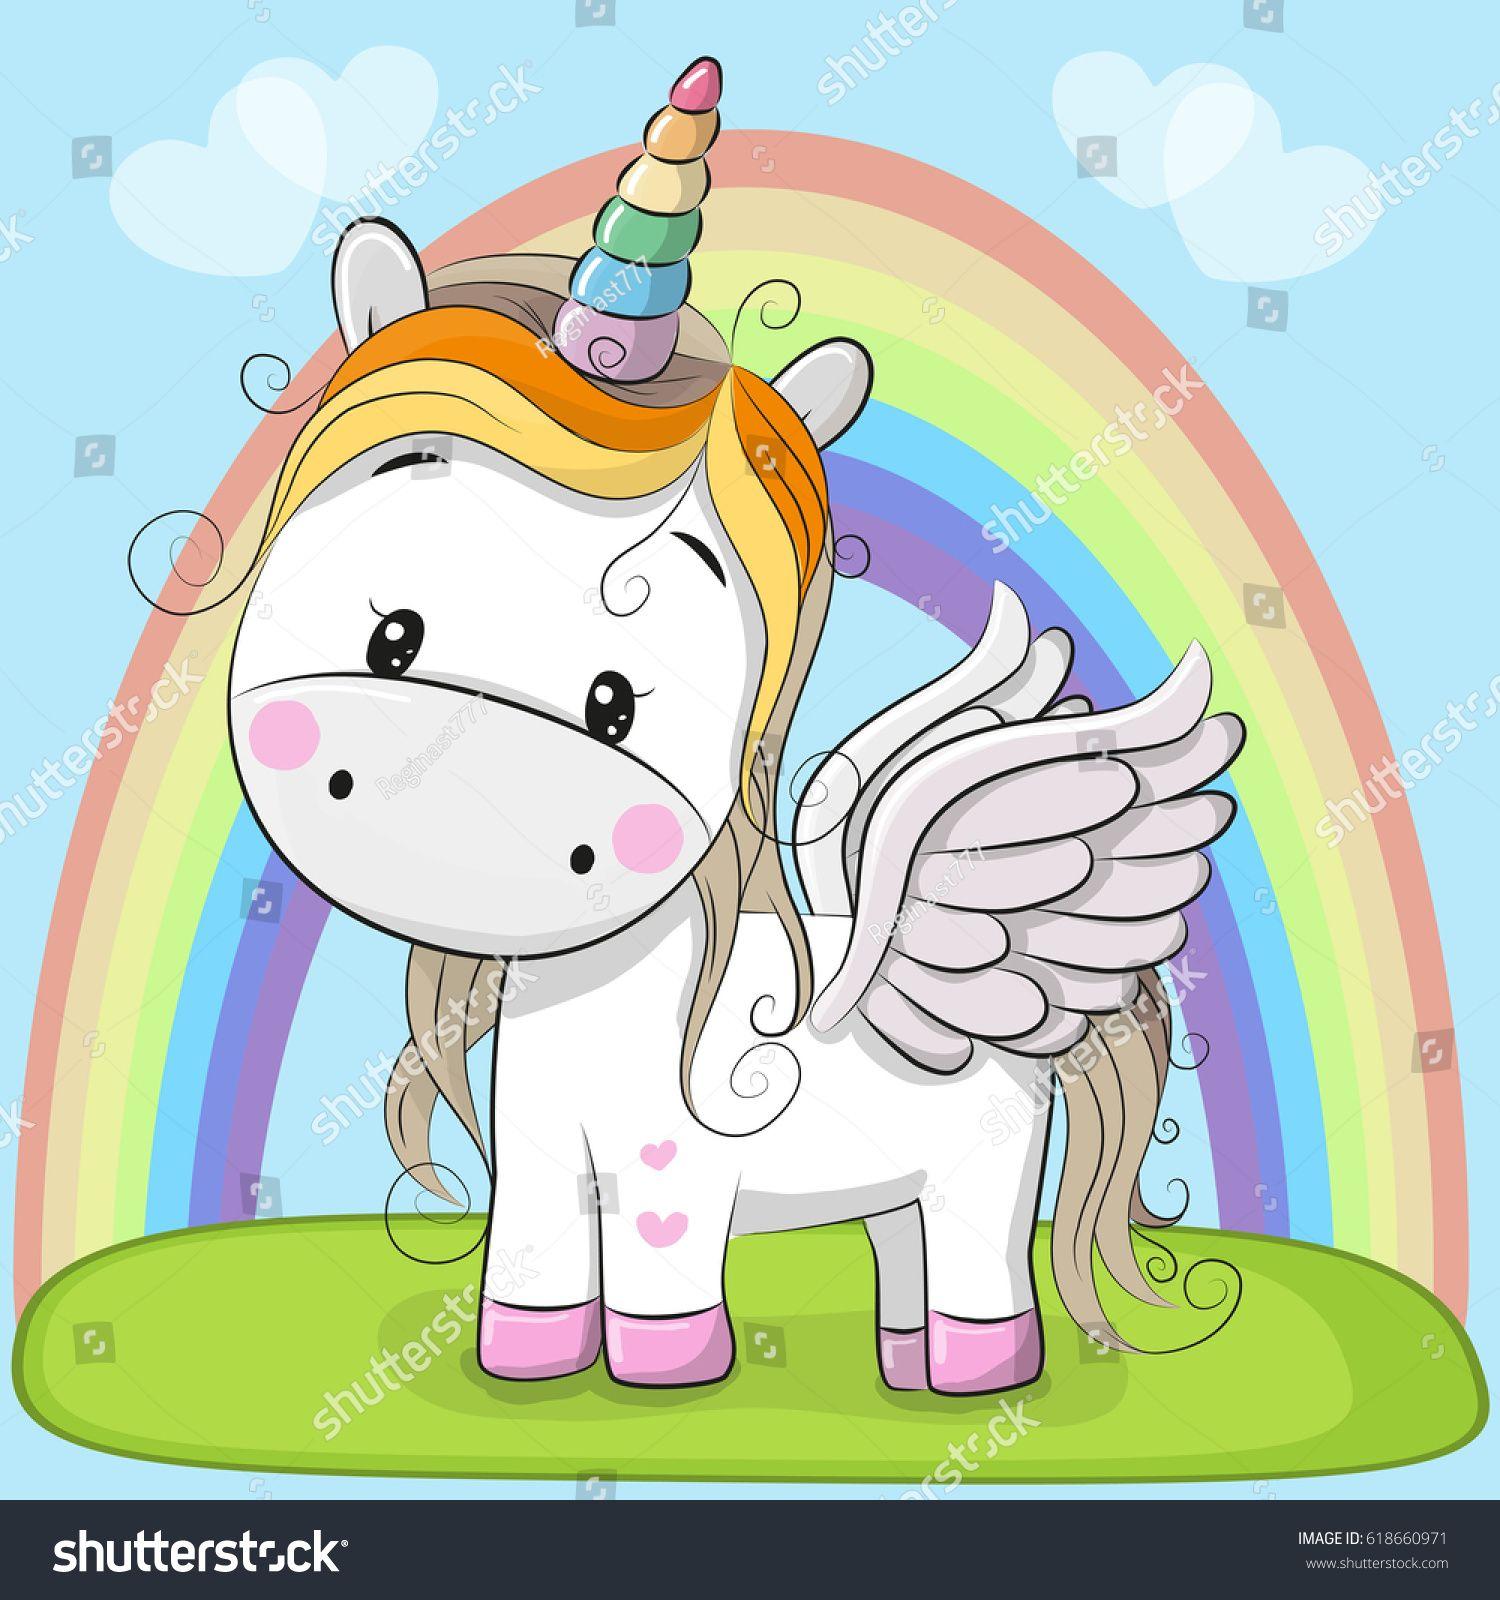 cute unicorn cartoon - HD1500×1600